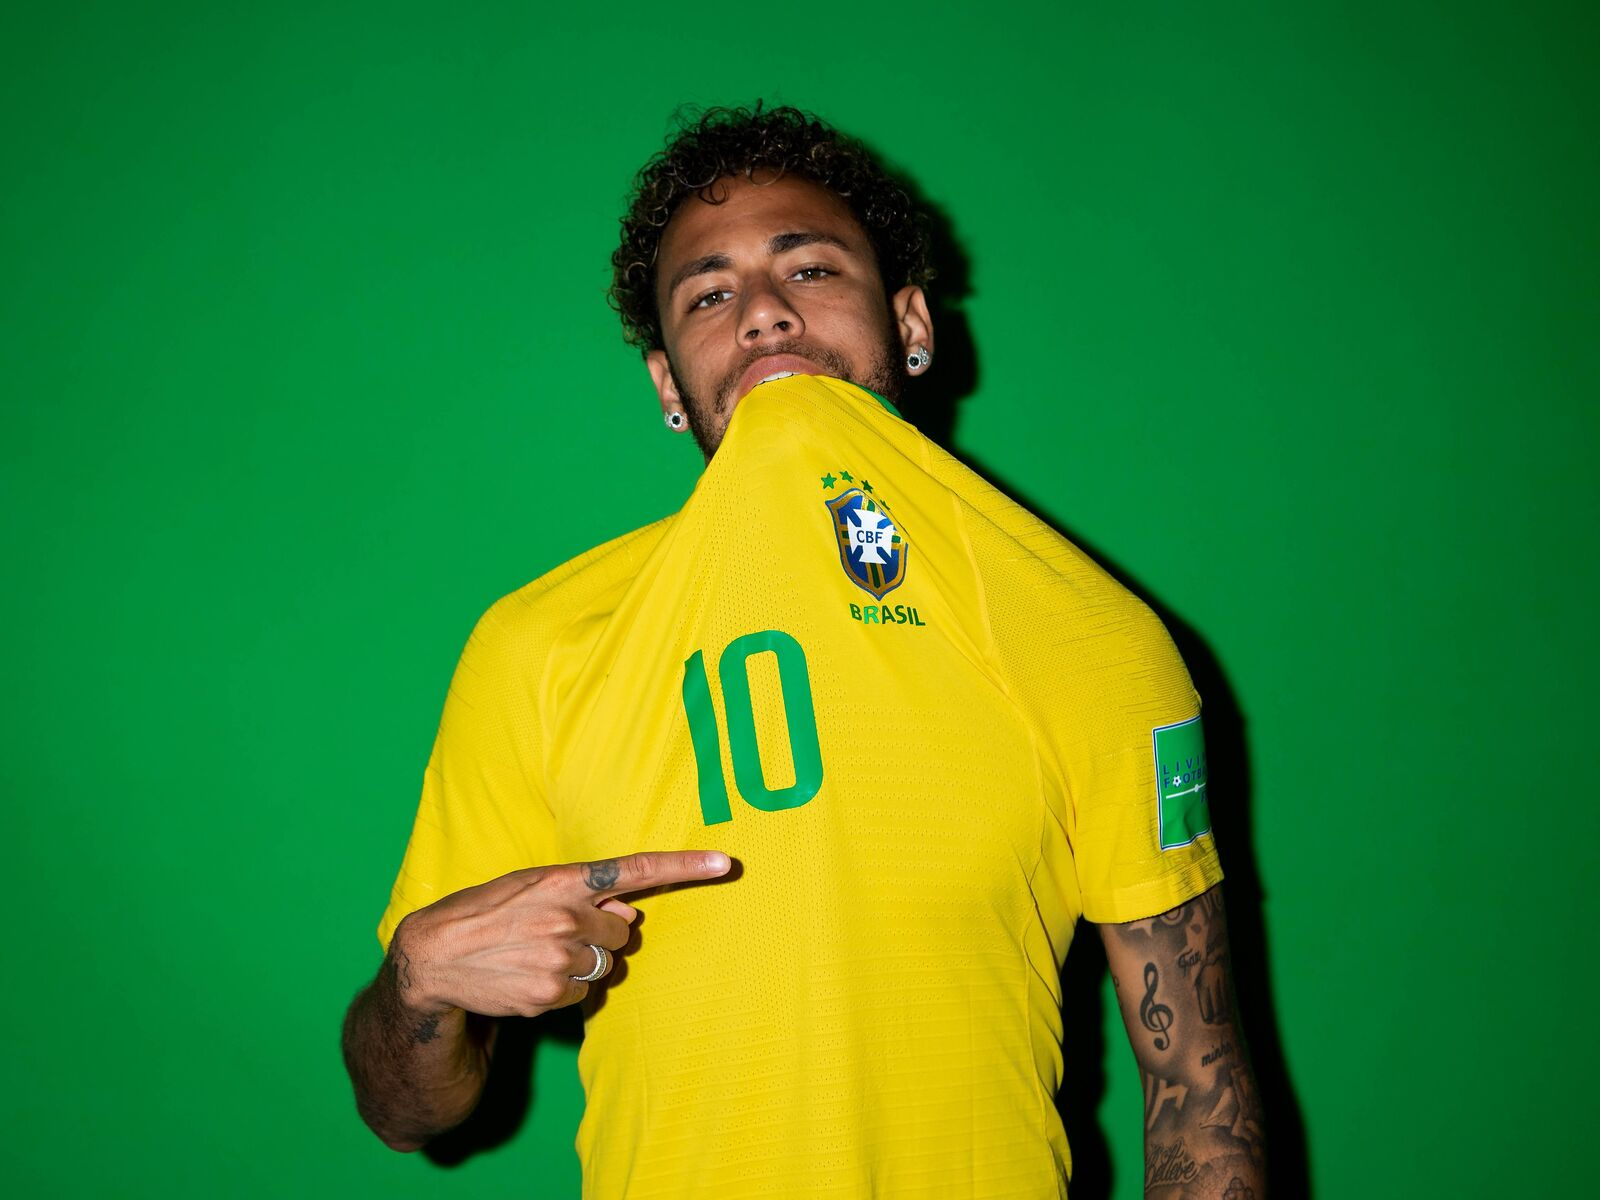 neymar-jr-brazil-portraits-2018-9z.jpg